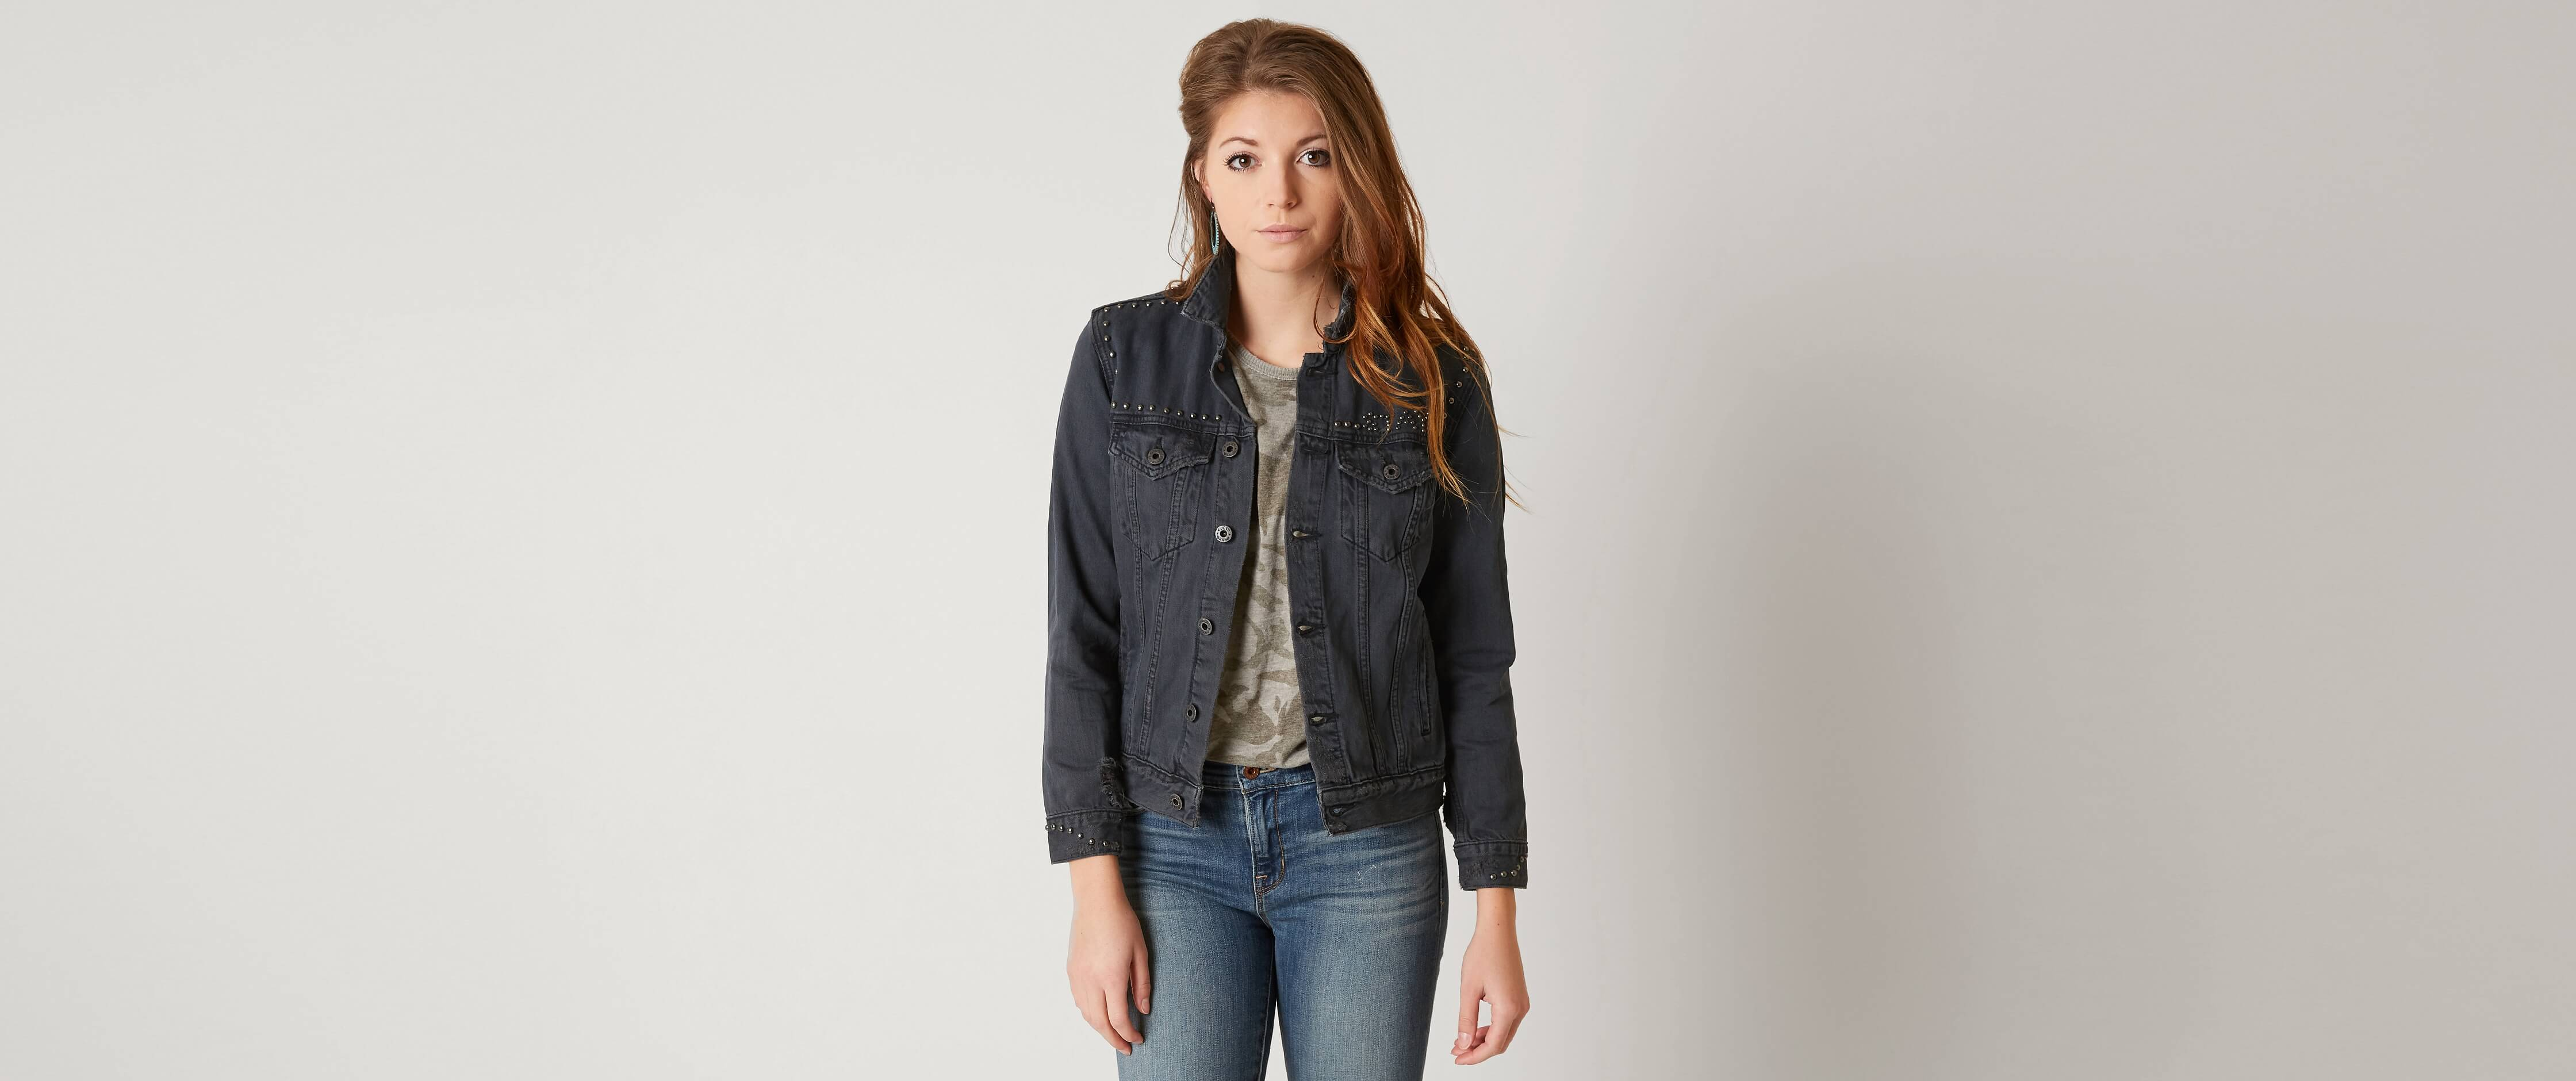 Lucky brand women's black leather jacket